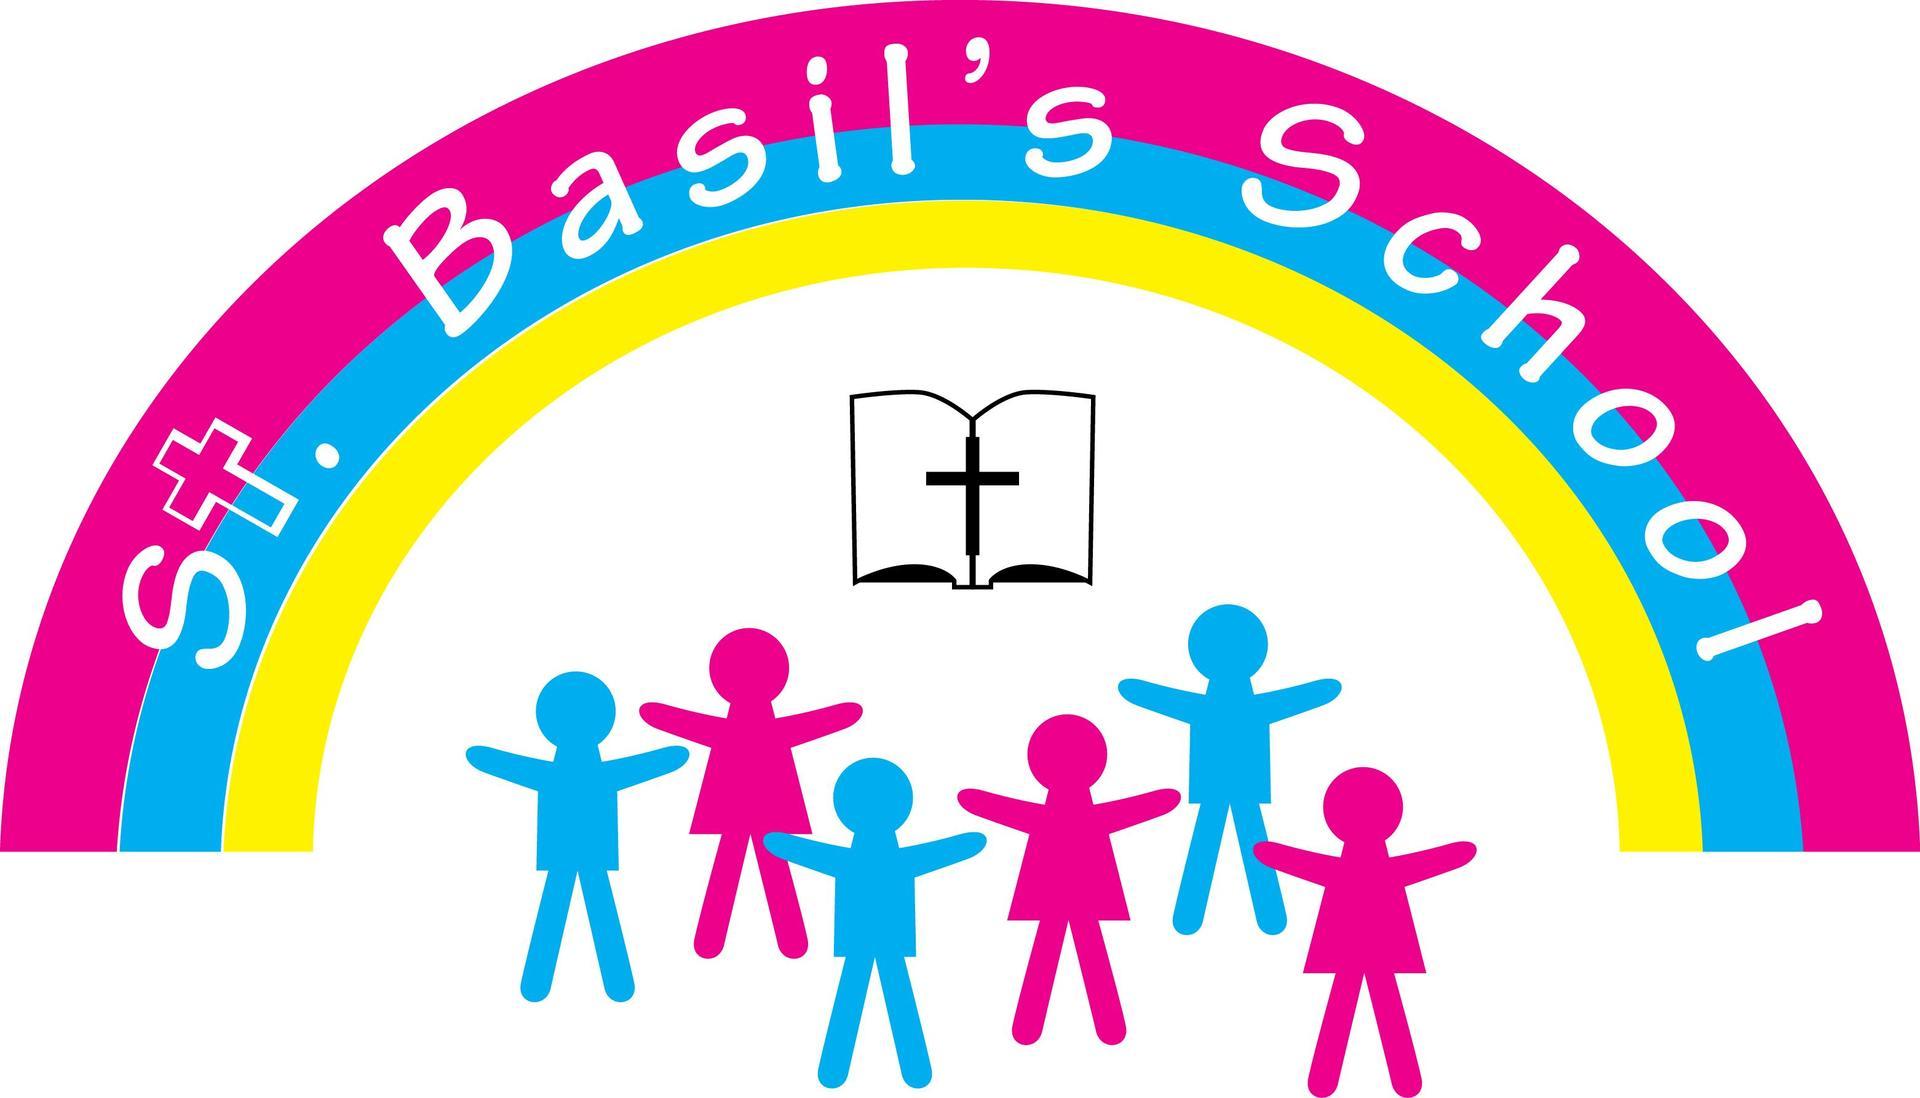 St. Basil's School logo